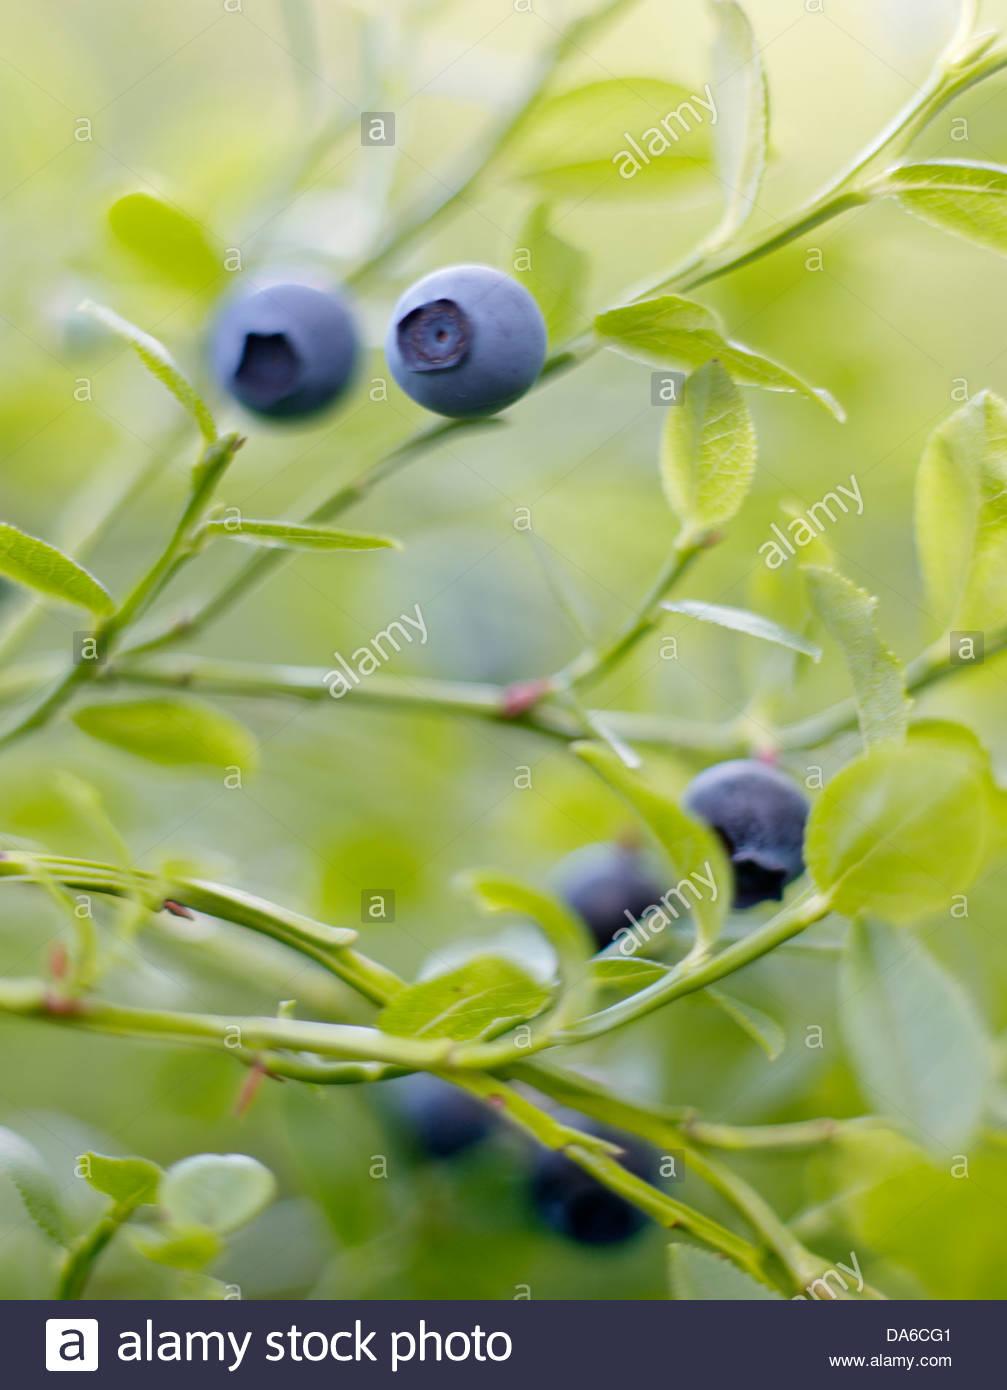 Blueberries growing on twig - Stock Image